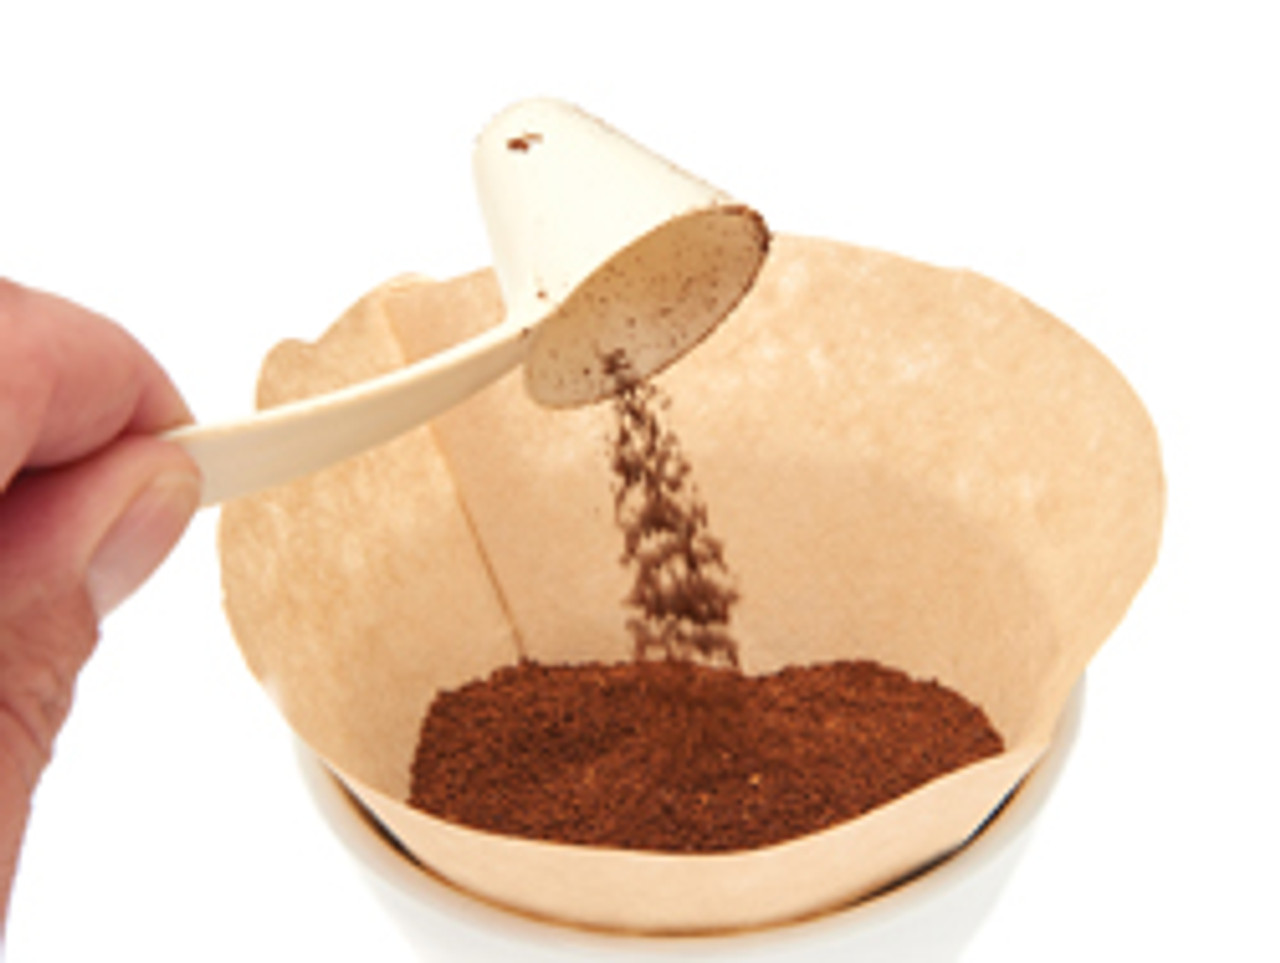 Beyond Gourmet Unbleached Coffee Filter #2